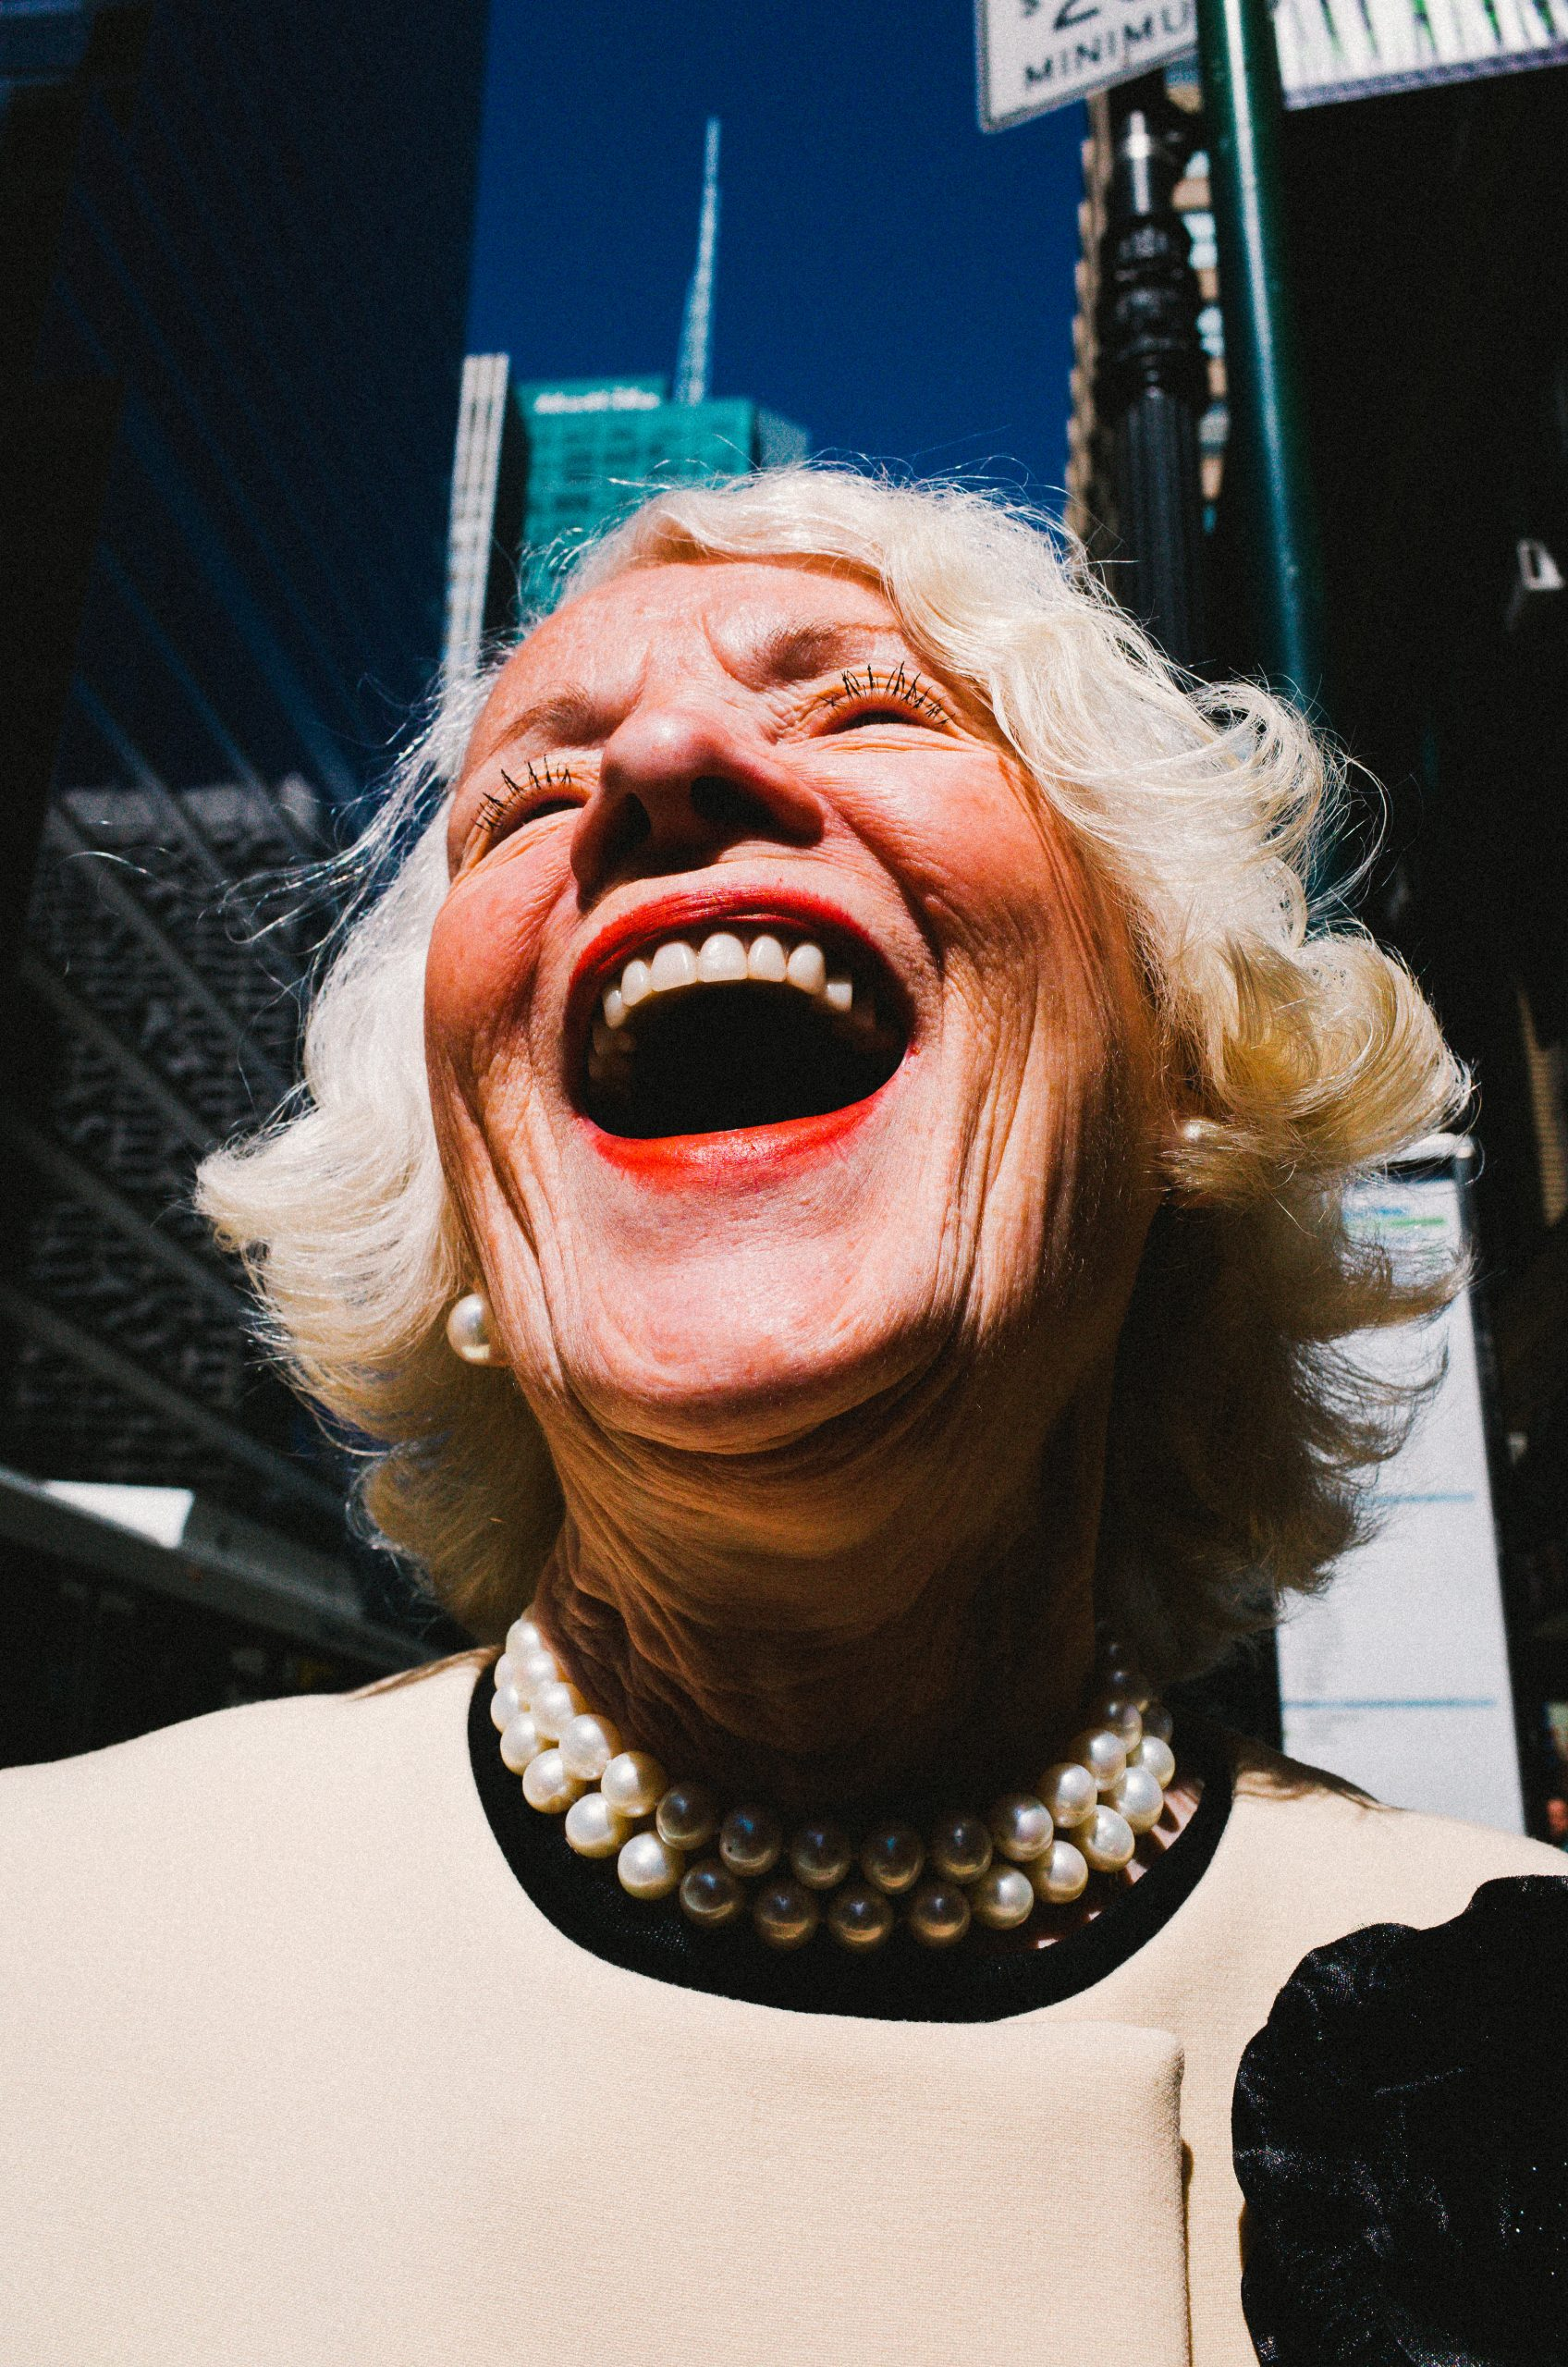 ERIC-KIM-laughing-lady-new-york-city